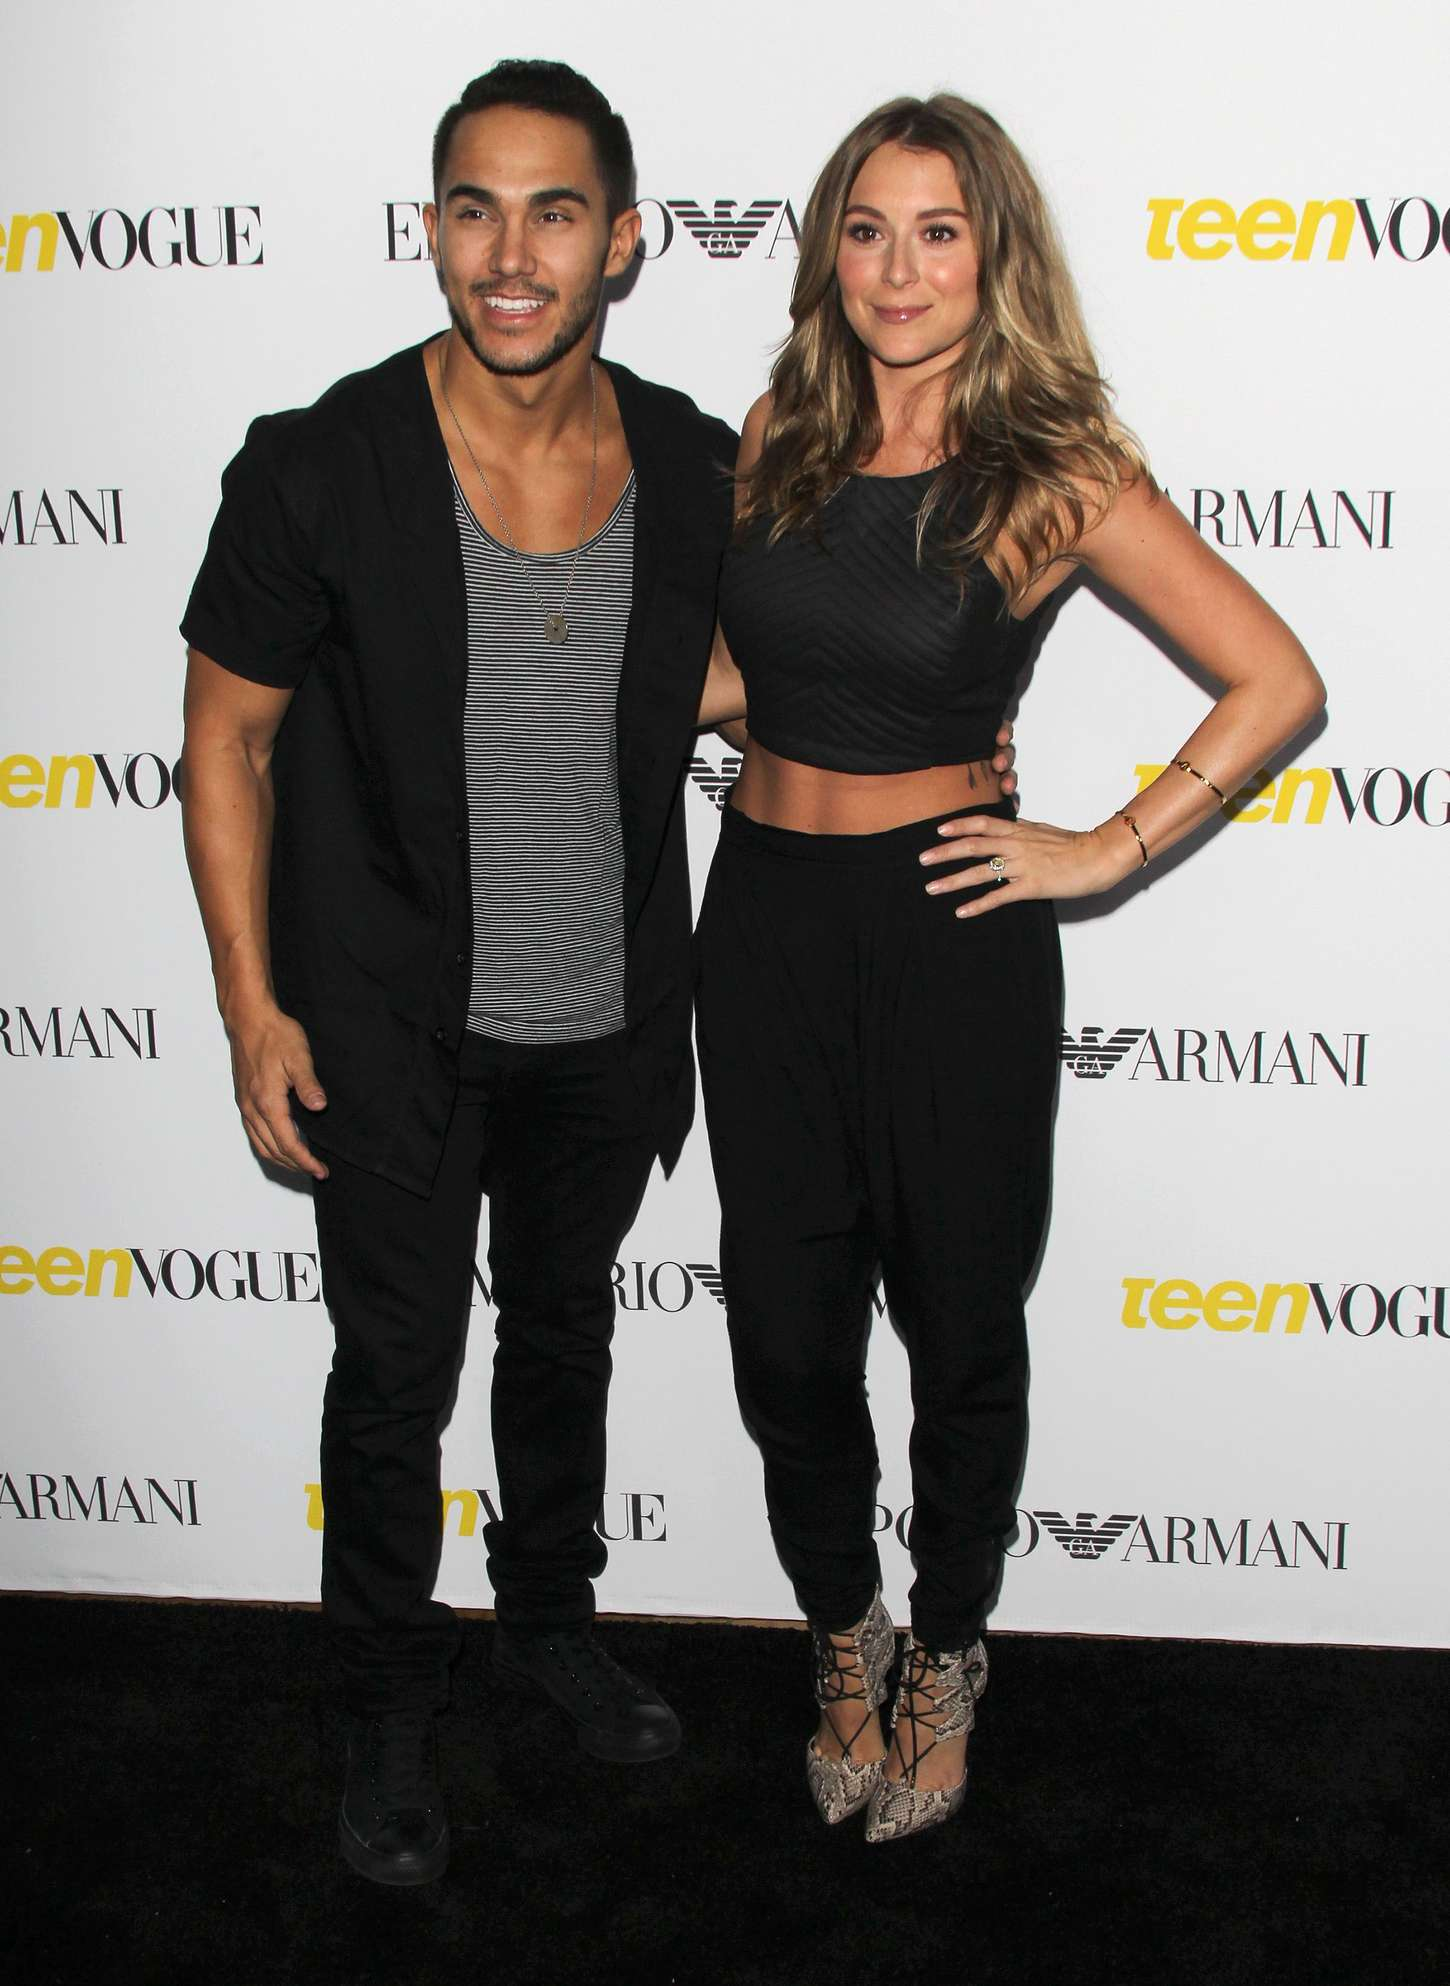 Alexa Vega 2015 : Alexa Vega: 2015 Teen Vogue Young Hollywood Party -04